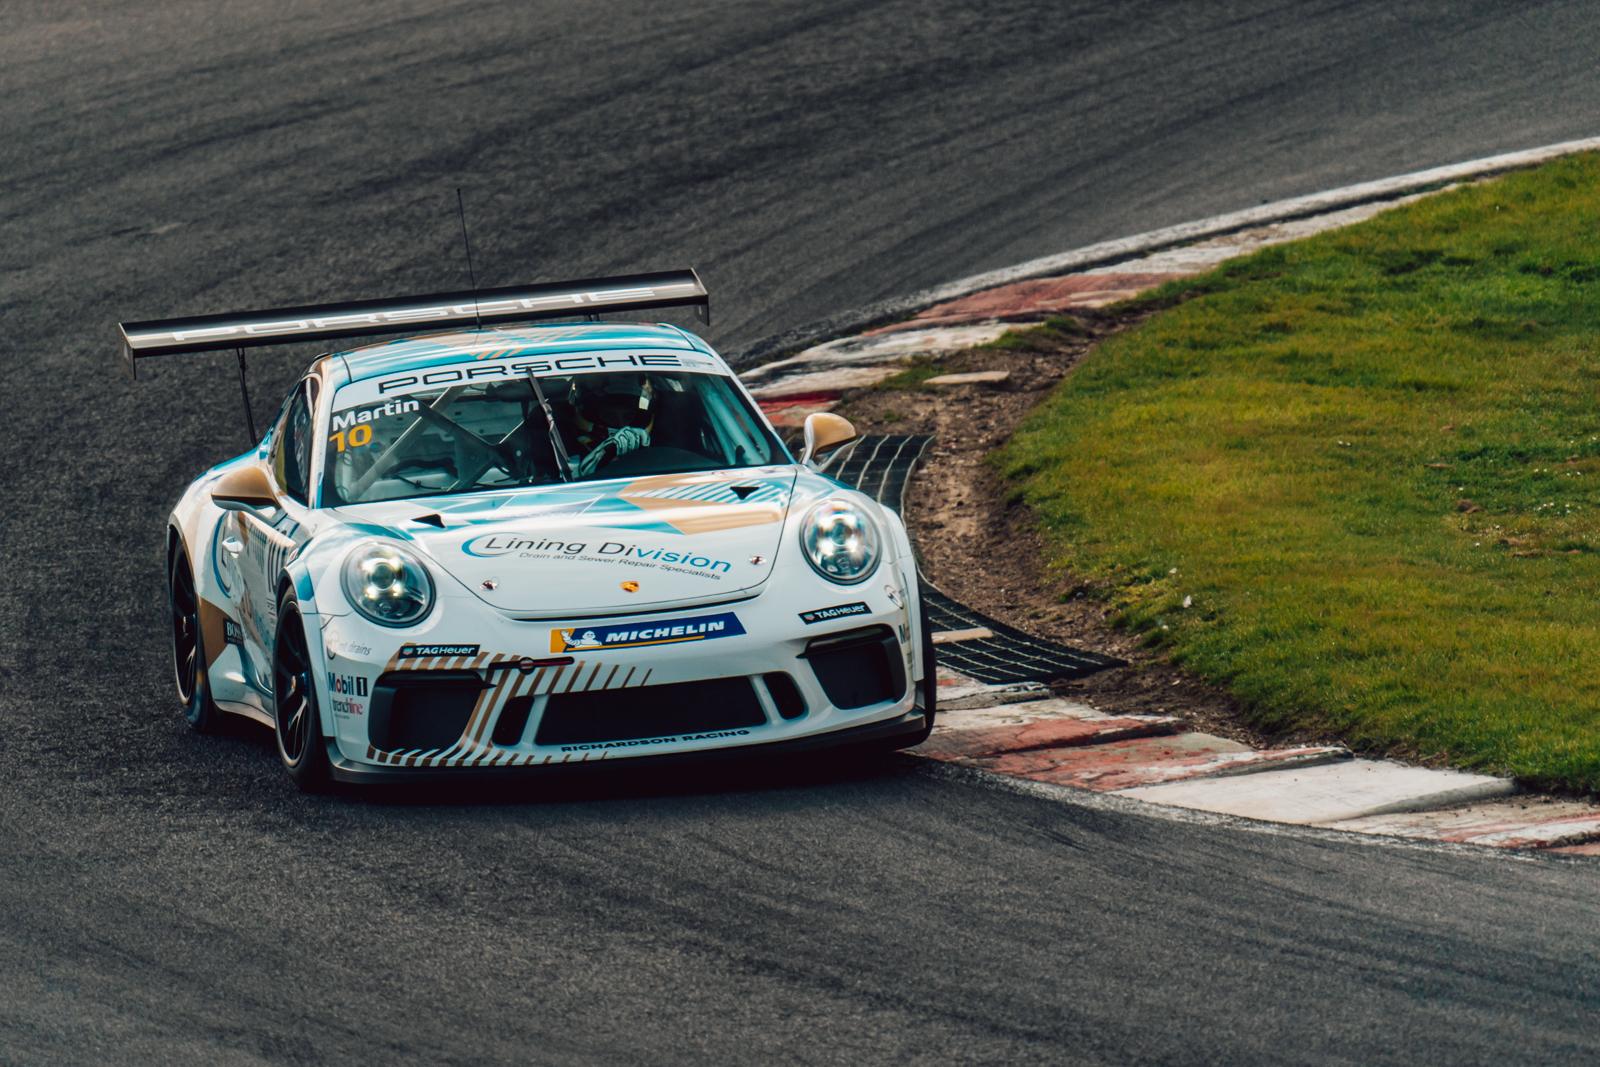 Richardson Racing retains Will Martin for 2021 Porsche Carrera Cup GB programme